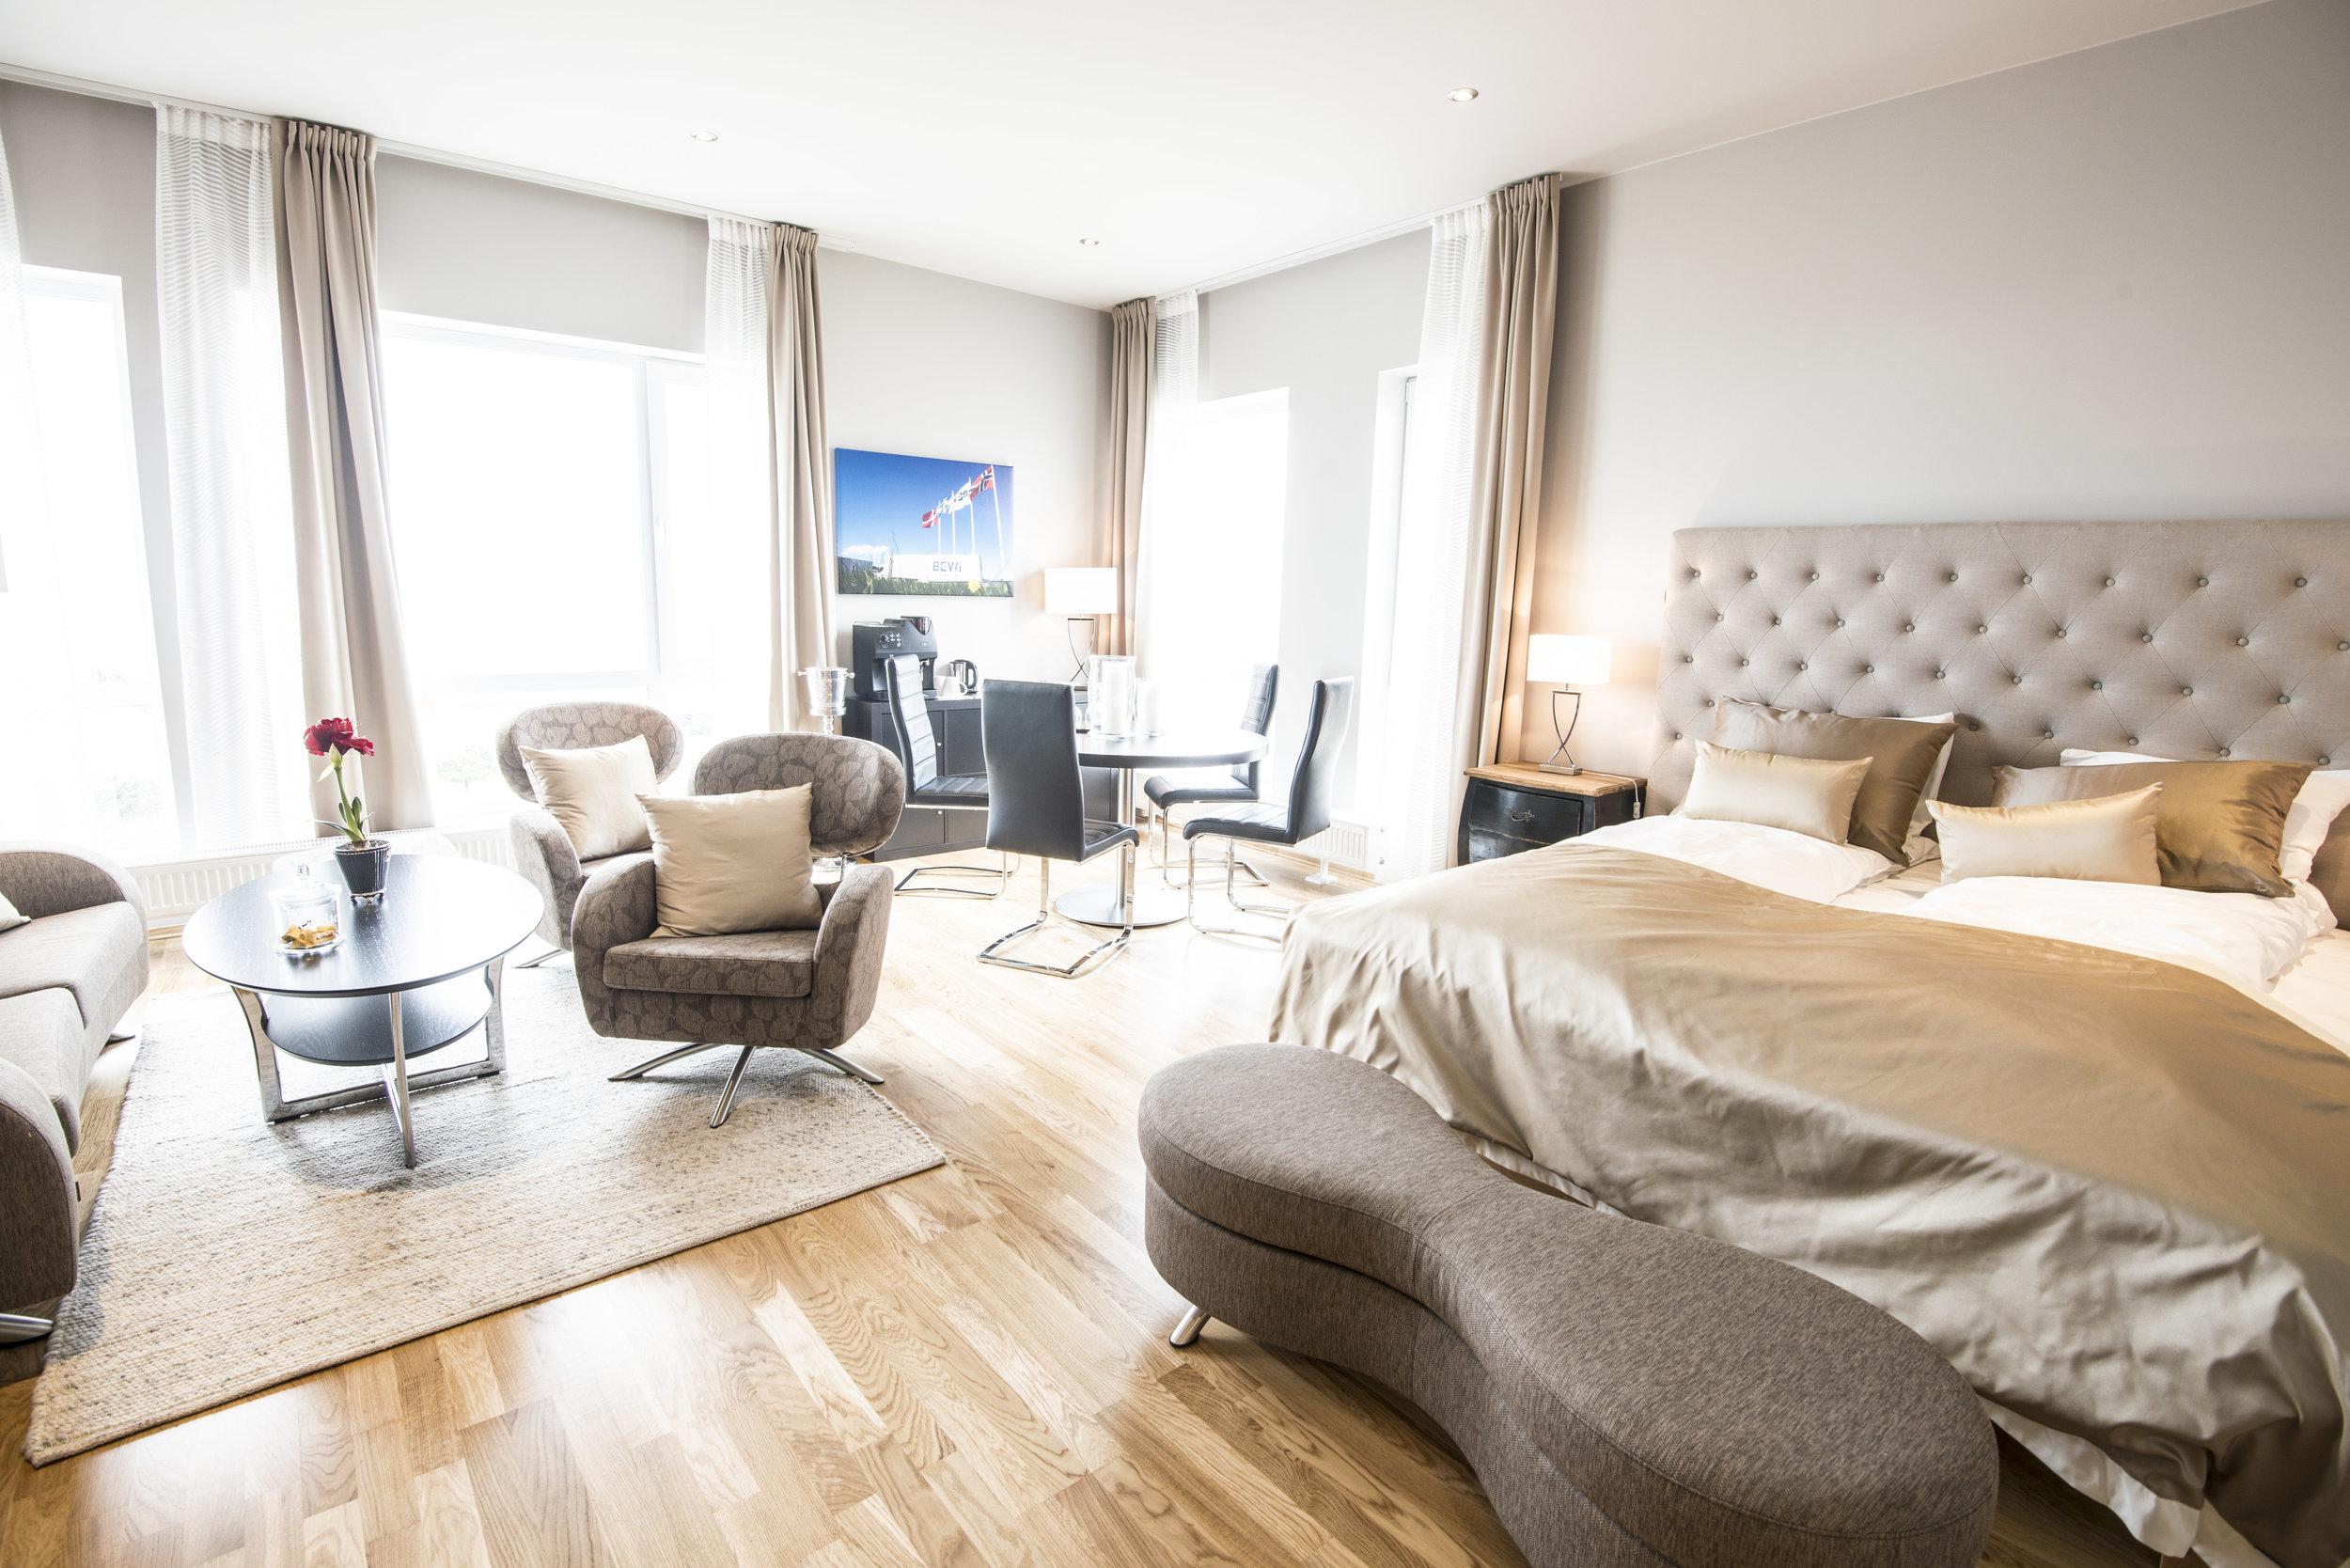 hotellfrøya-8007755.jpg